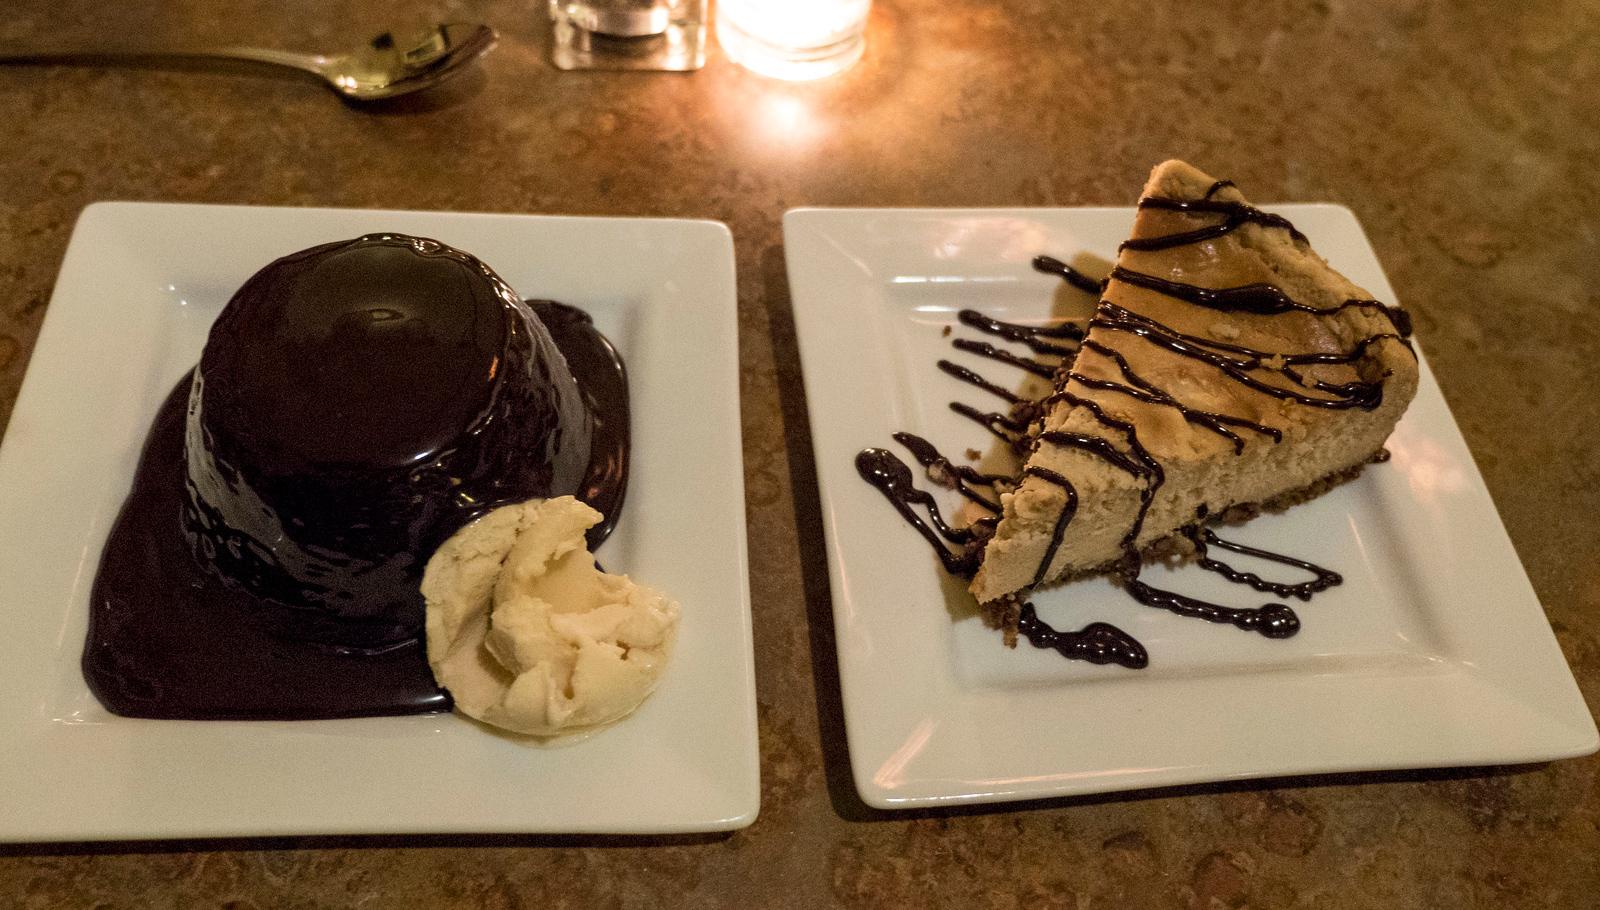 Peanut butter cheesecake and chocolate cake - Vegan - Merge